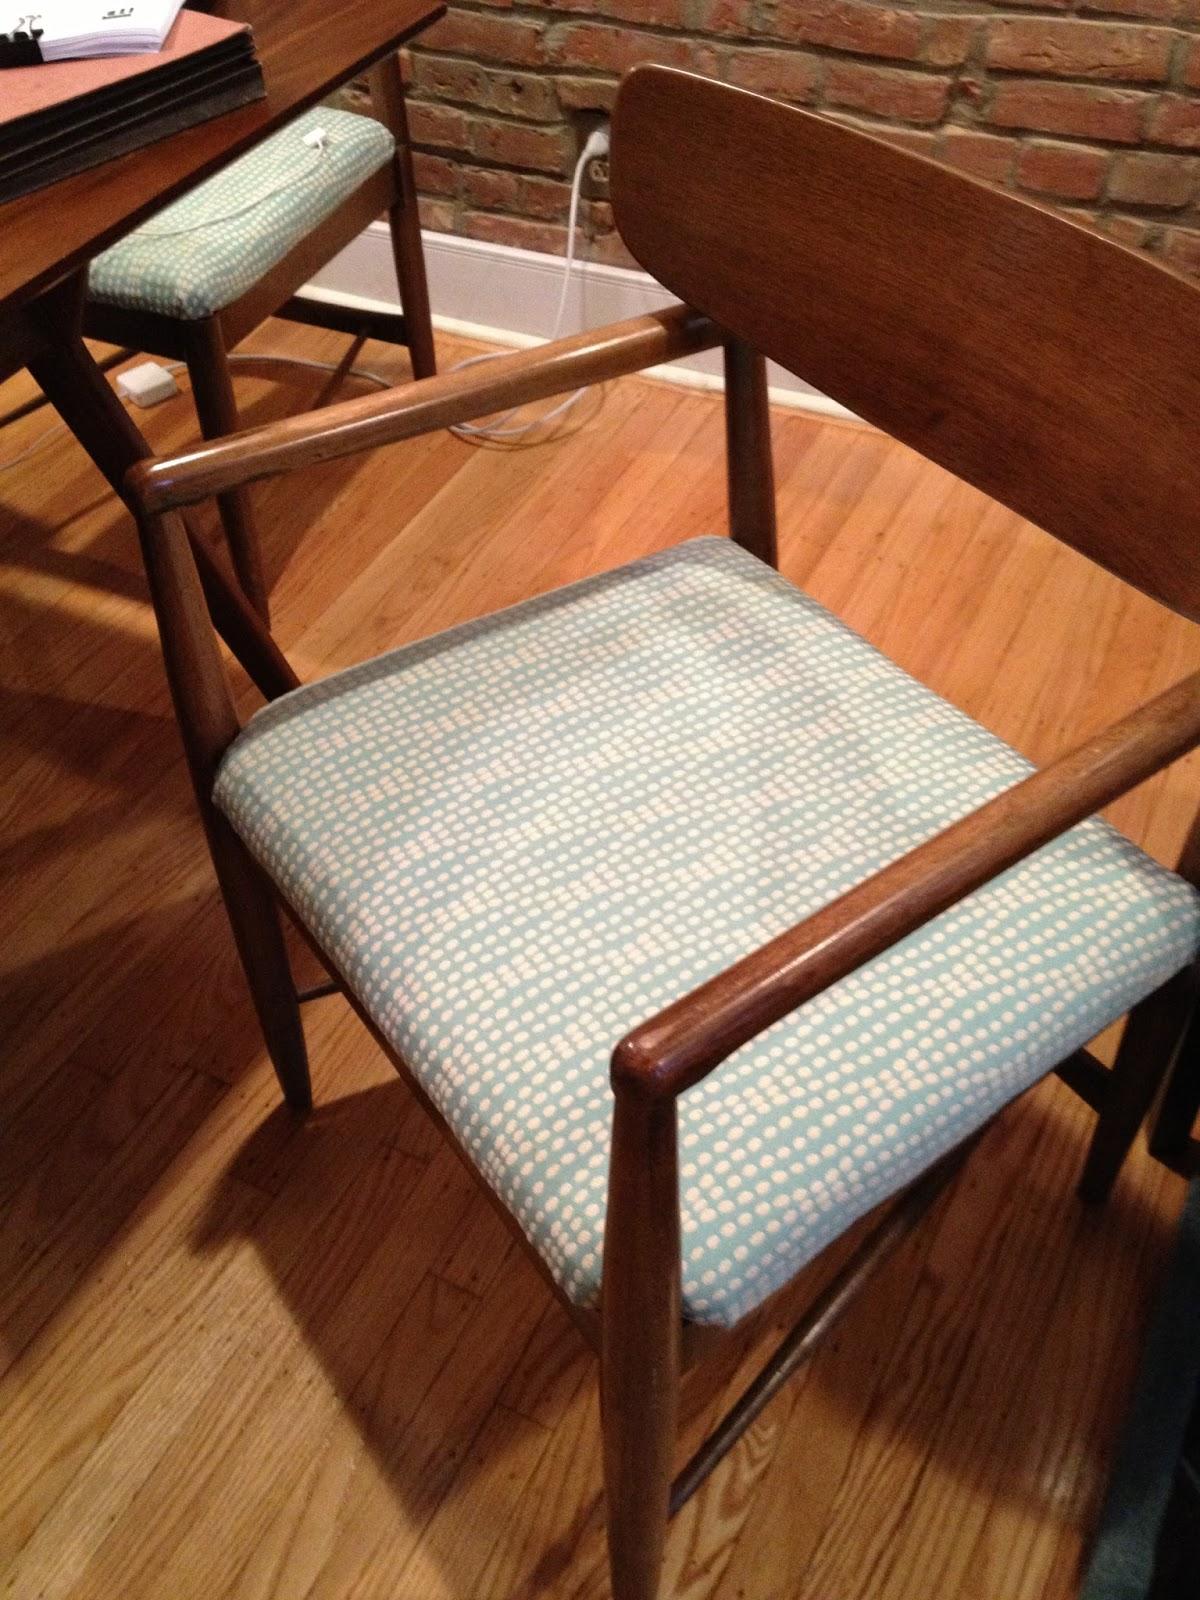 1970 Dogwood Street Dining Chair Fabric Transformation : erinchairafter from 1970dogwoodst.blogspot.com size 1200 x 1600 jpeg 355kB